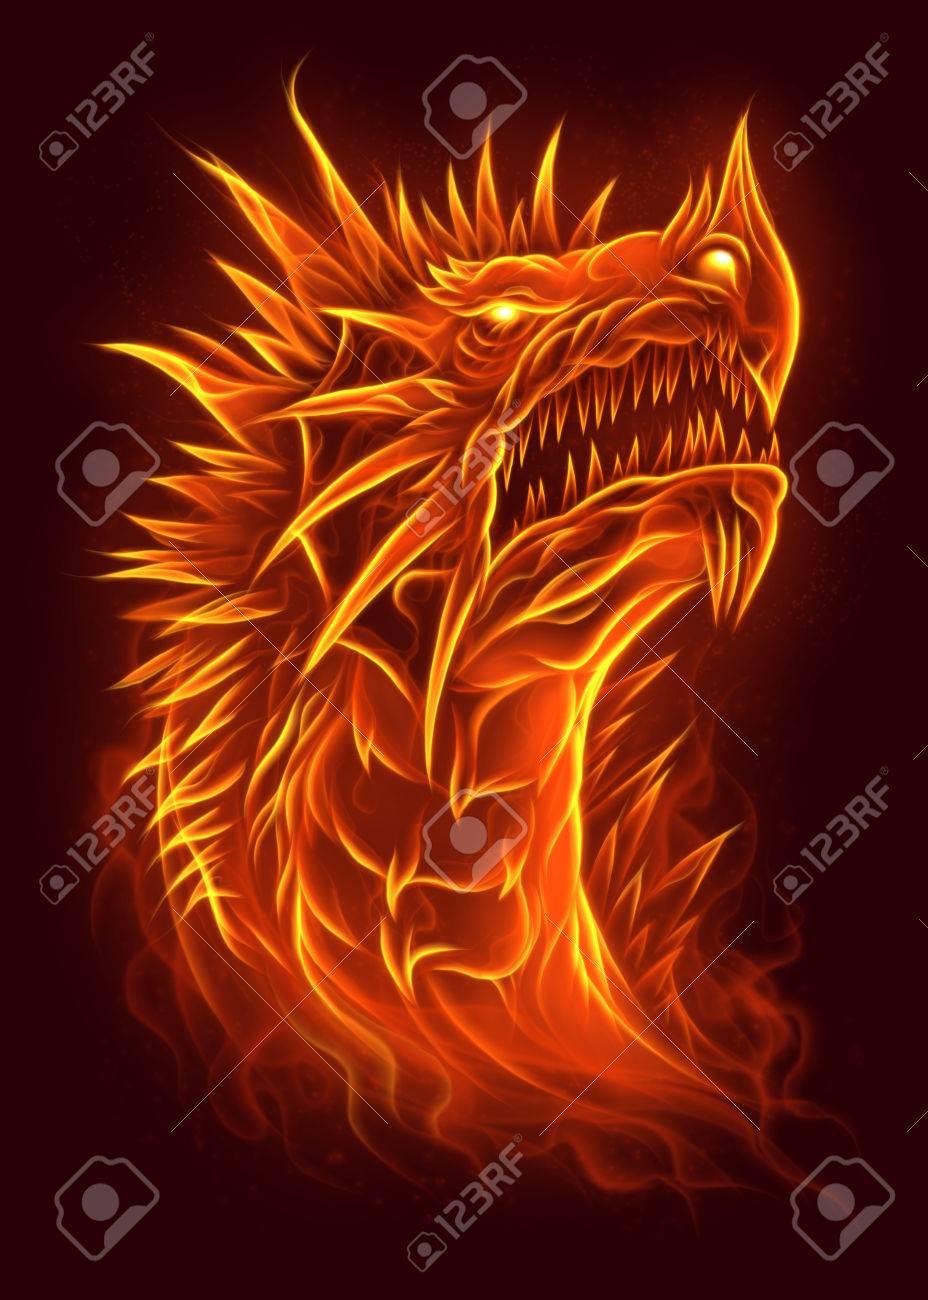 Fire dragon head - 67109477